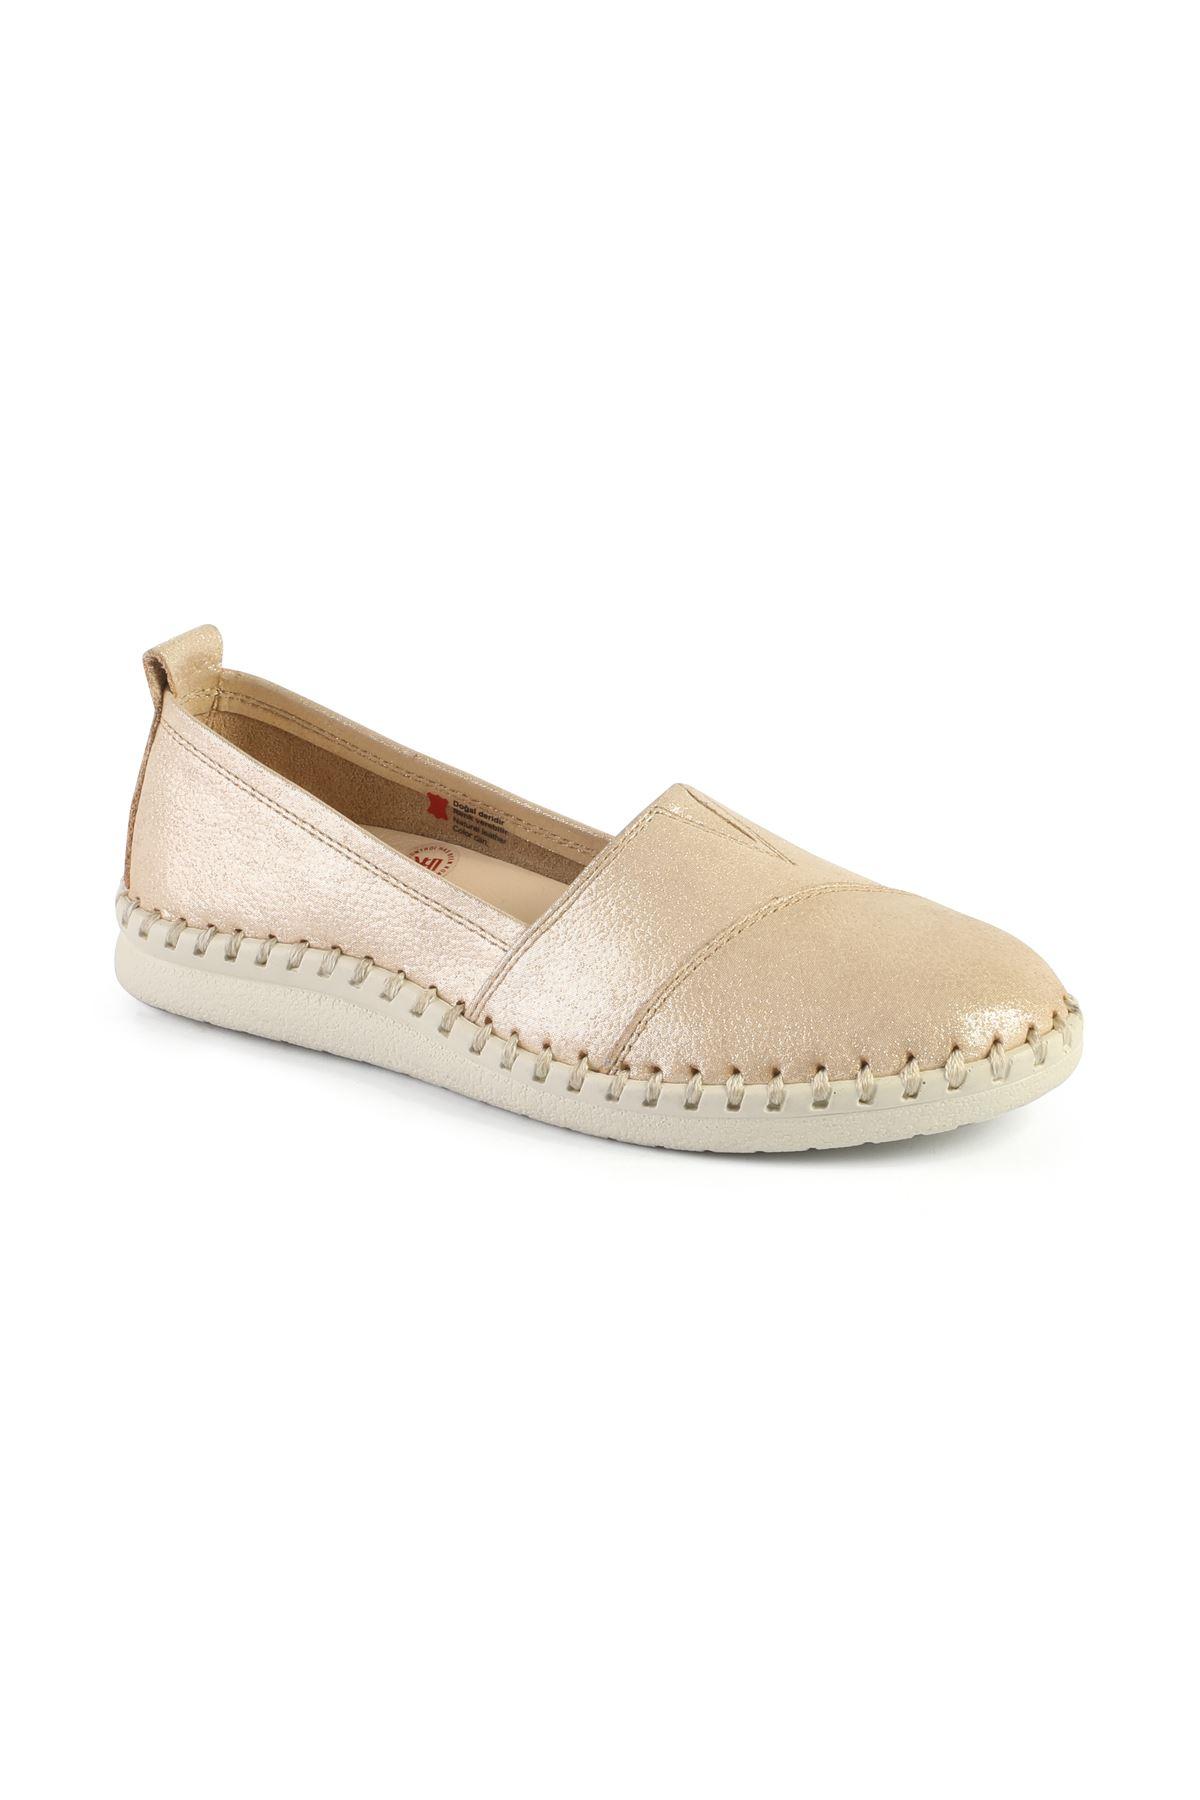 Libero AH6016 Bej Babet Ayakkabı